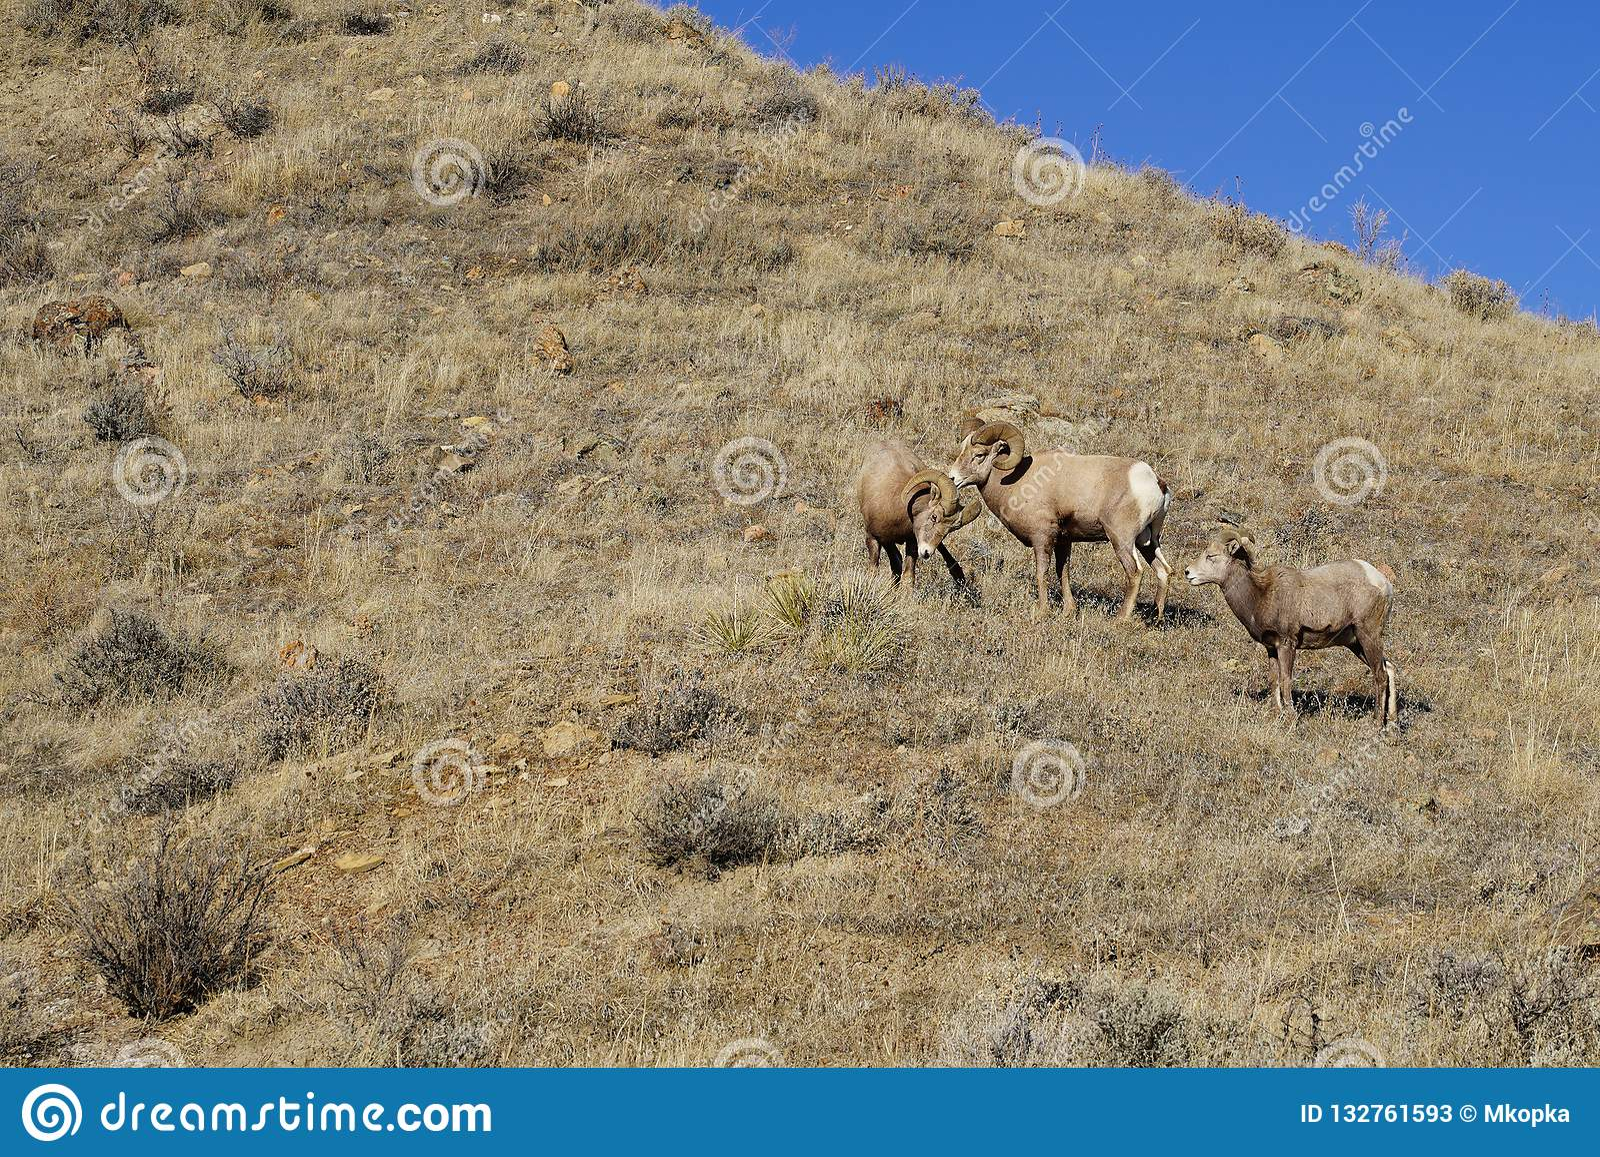 Two bighorn sheep rams start a fight over a ewe sheep watching